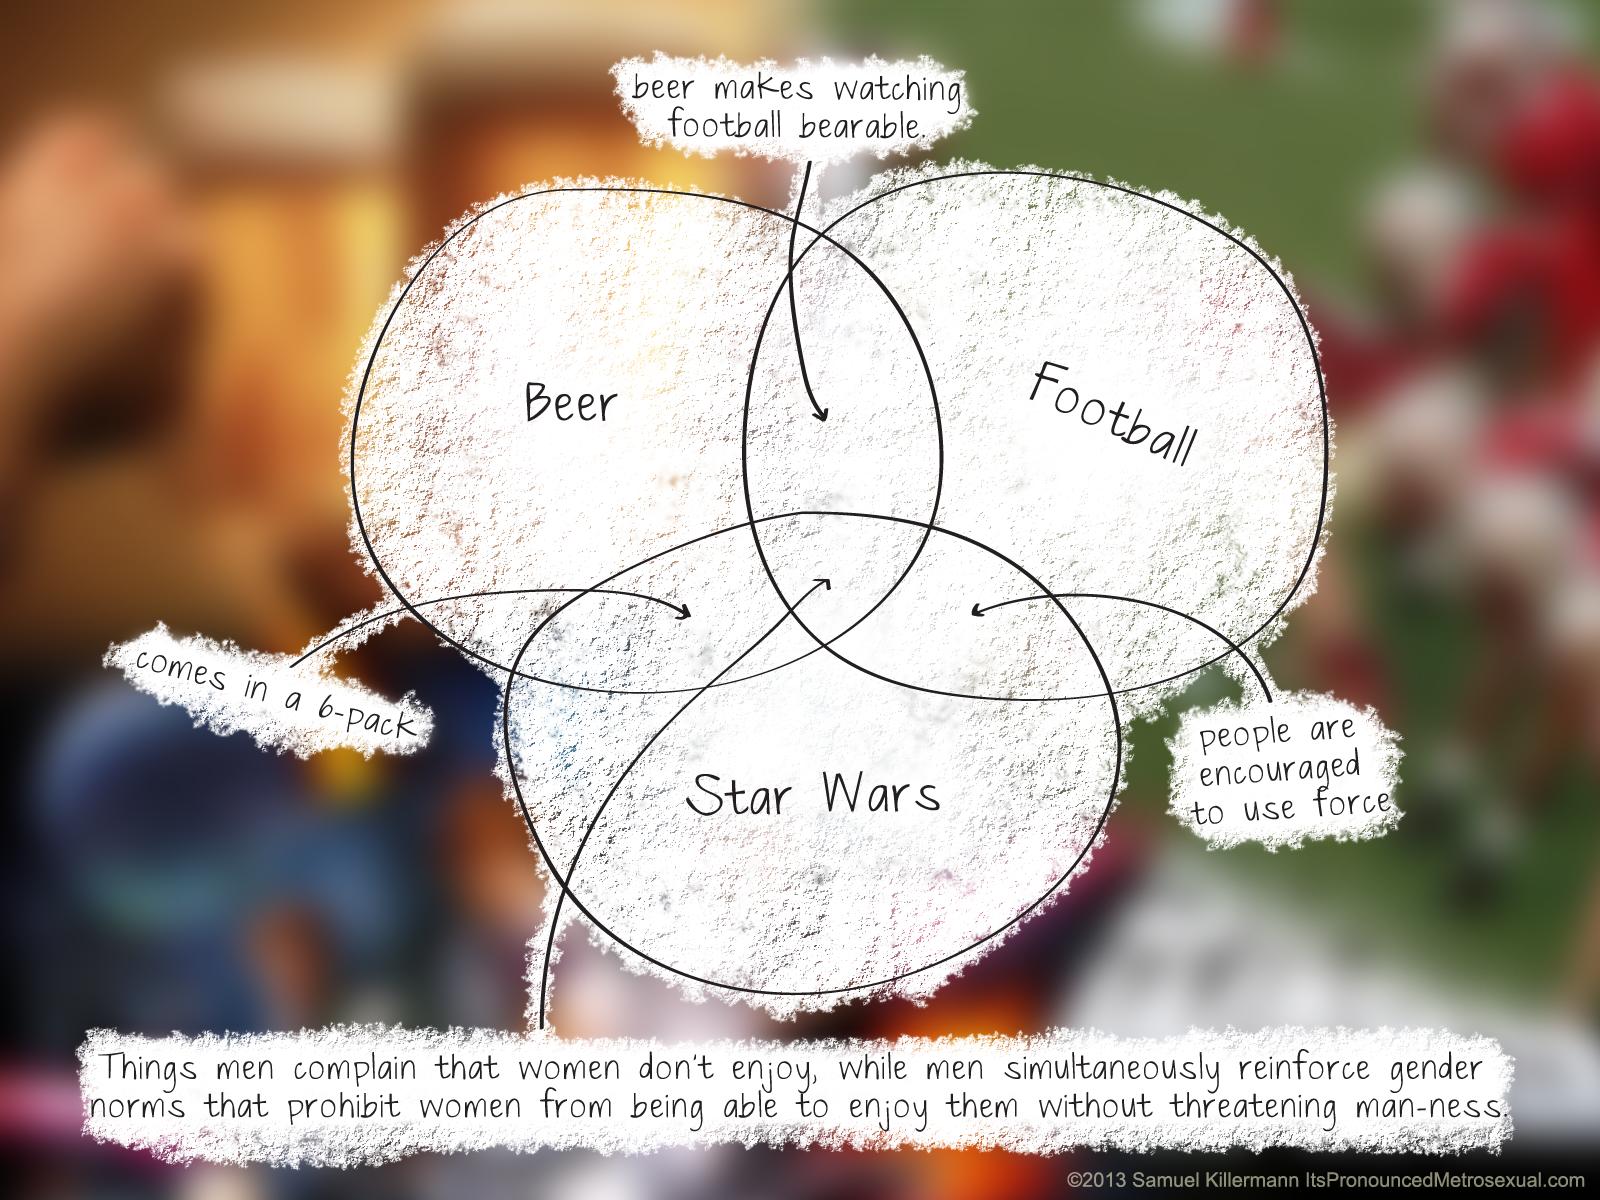 star-wars-beer-and-football